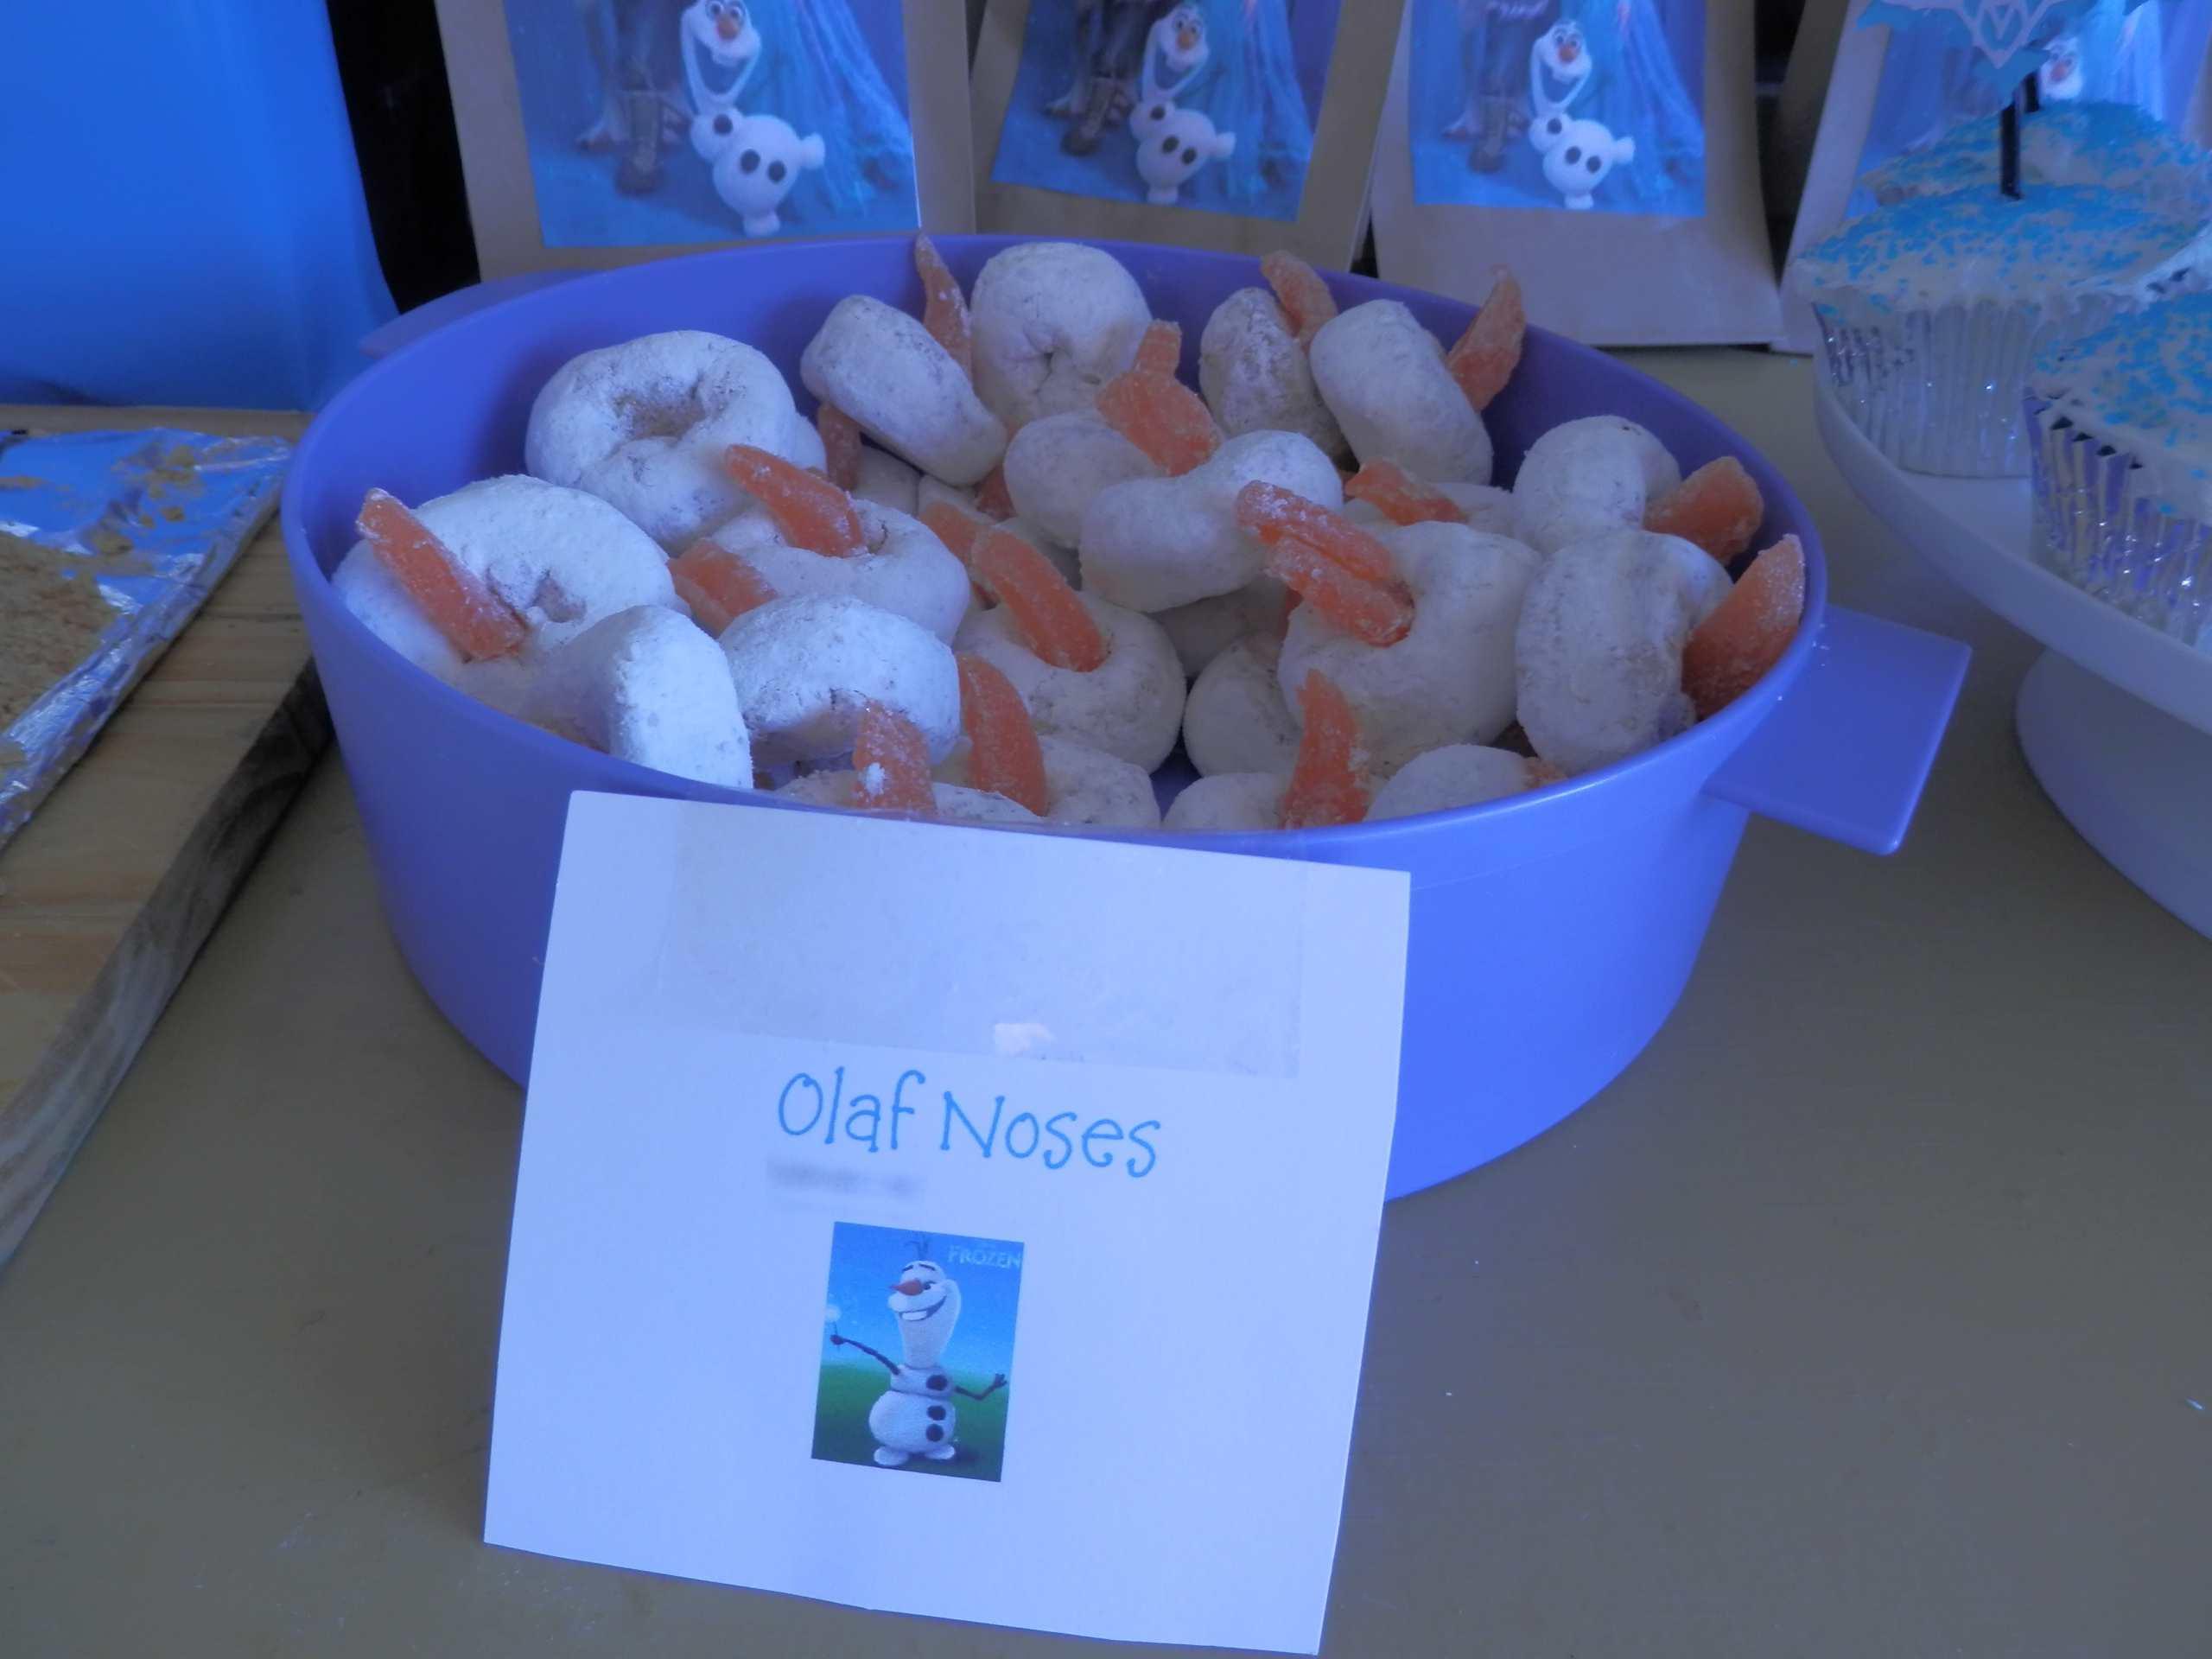 Disneys Frozen Themed Party Food Ideas